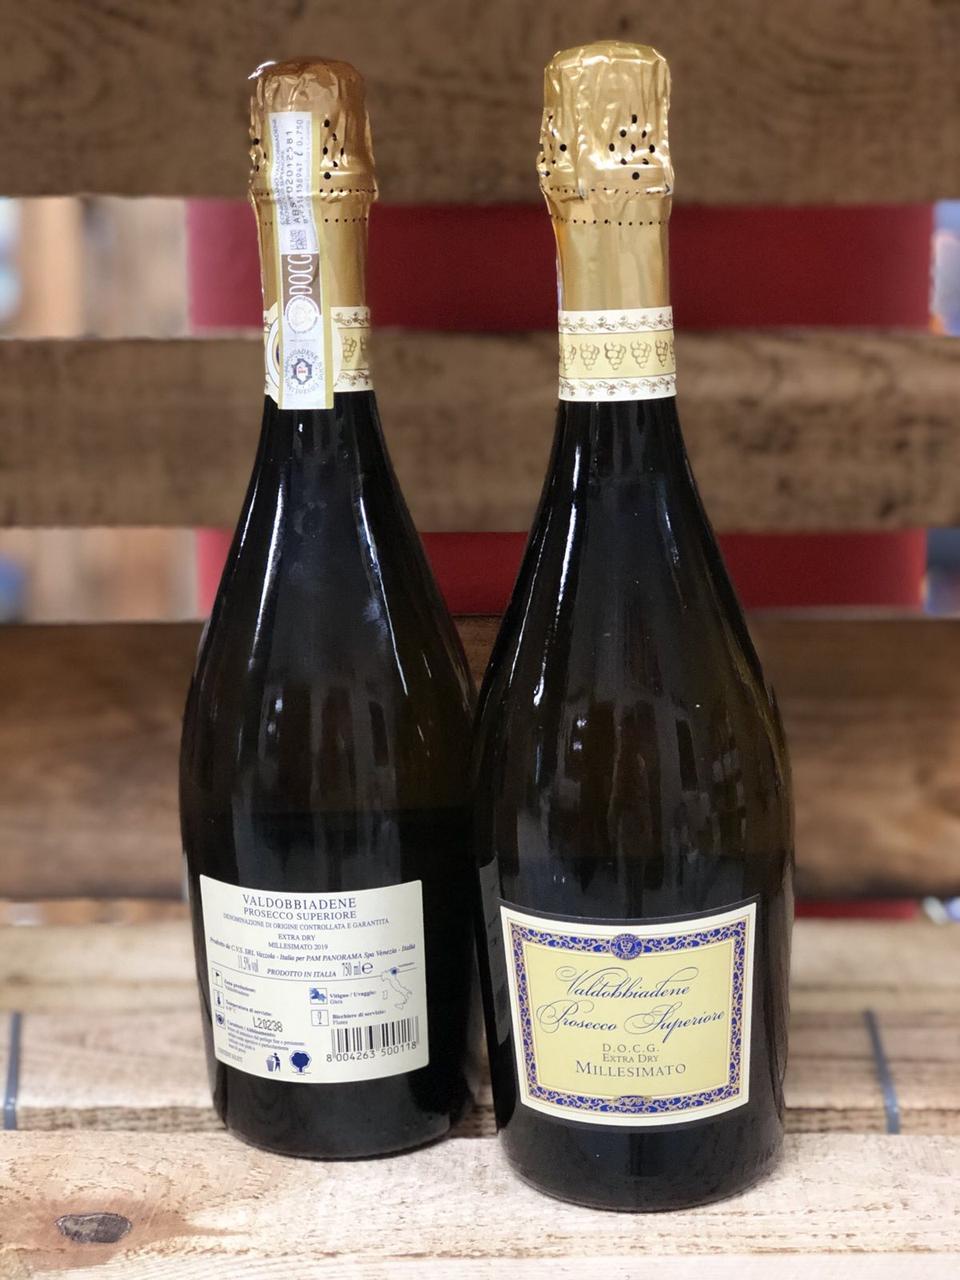 Вино игристое Prosecco Superiore DOCG 11,5% 750мл